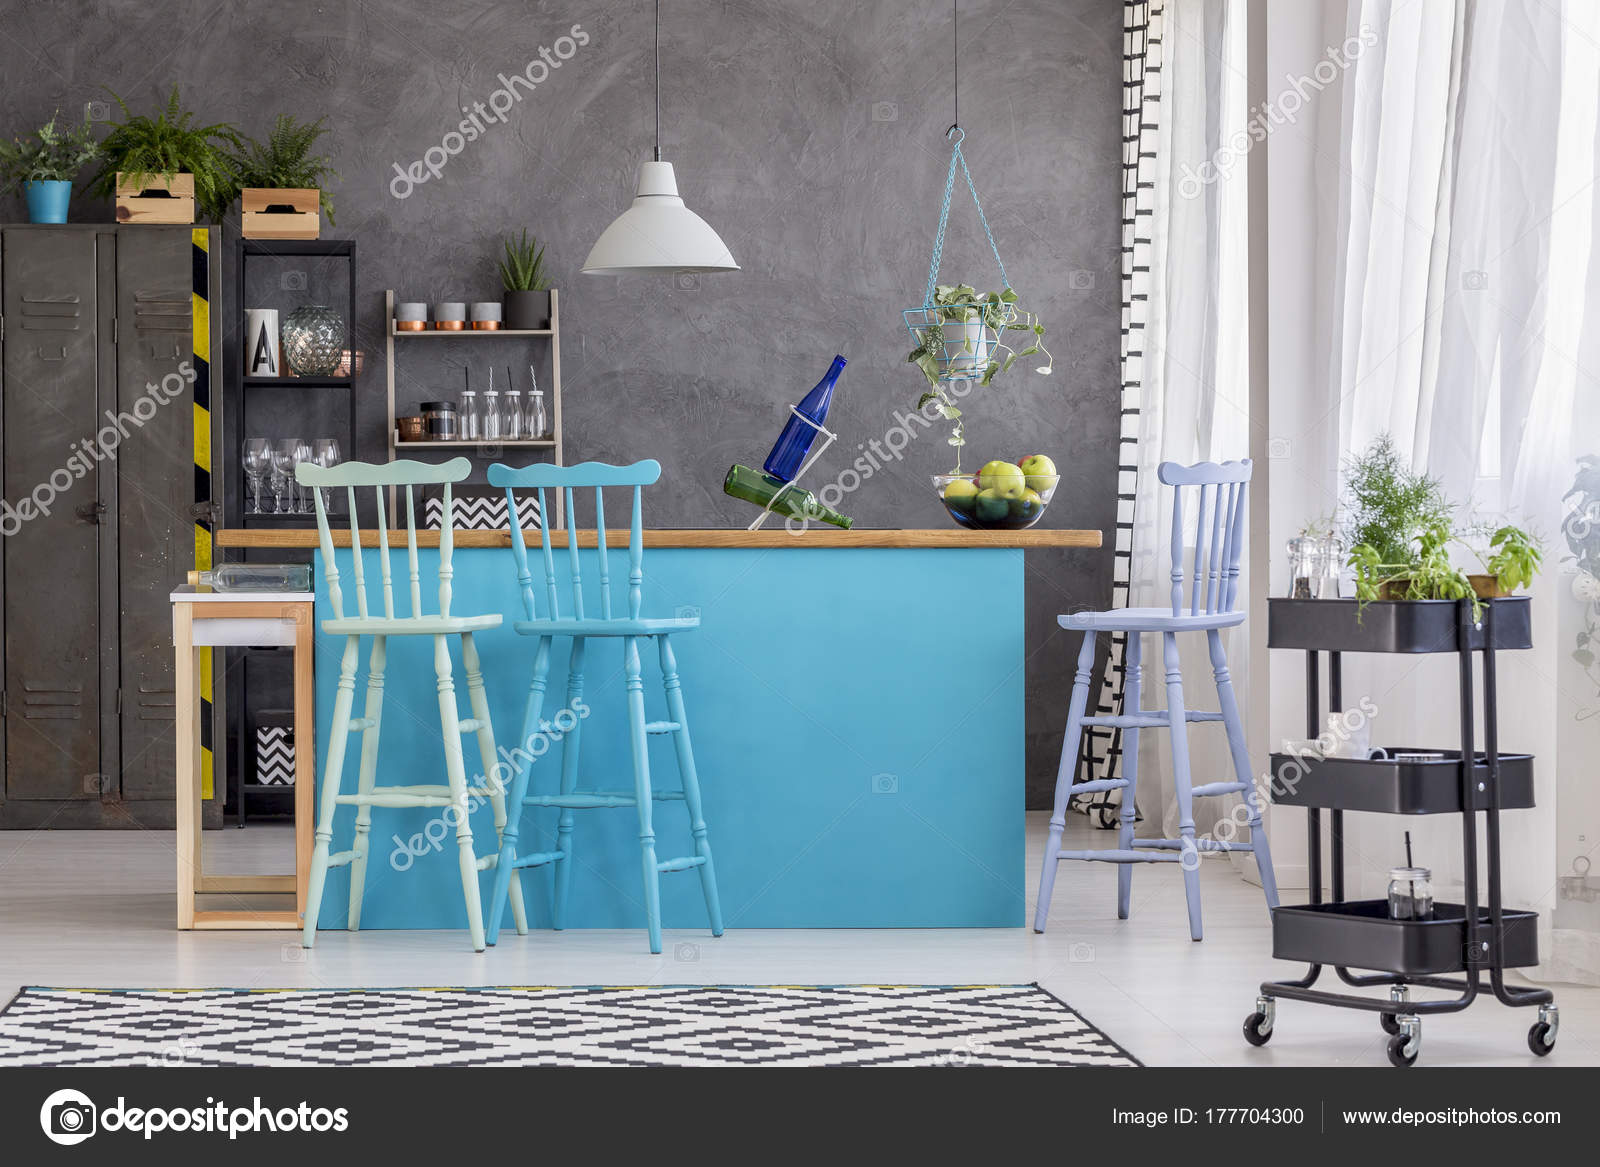 kitchen stool shaker style cabinets 凳子和蓝色的厨房岛 图库照片 c photographee eu 177704300